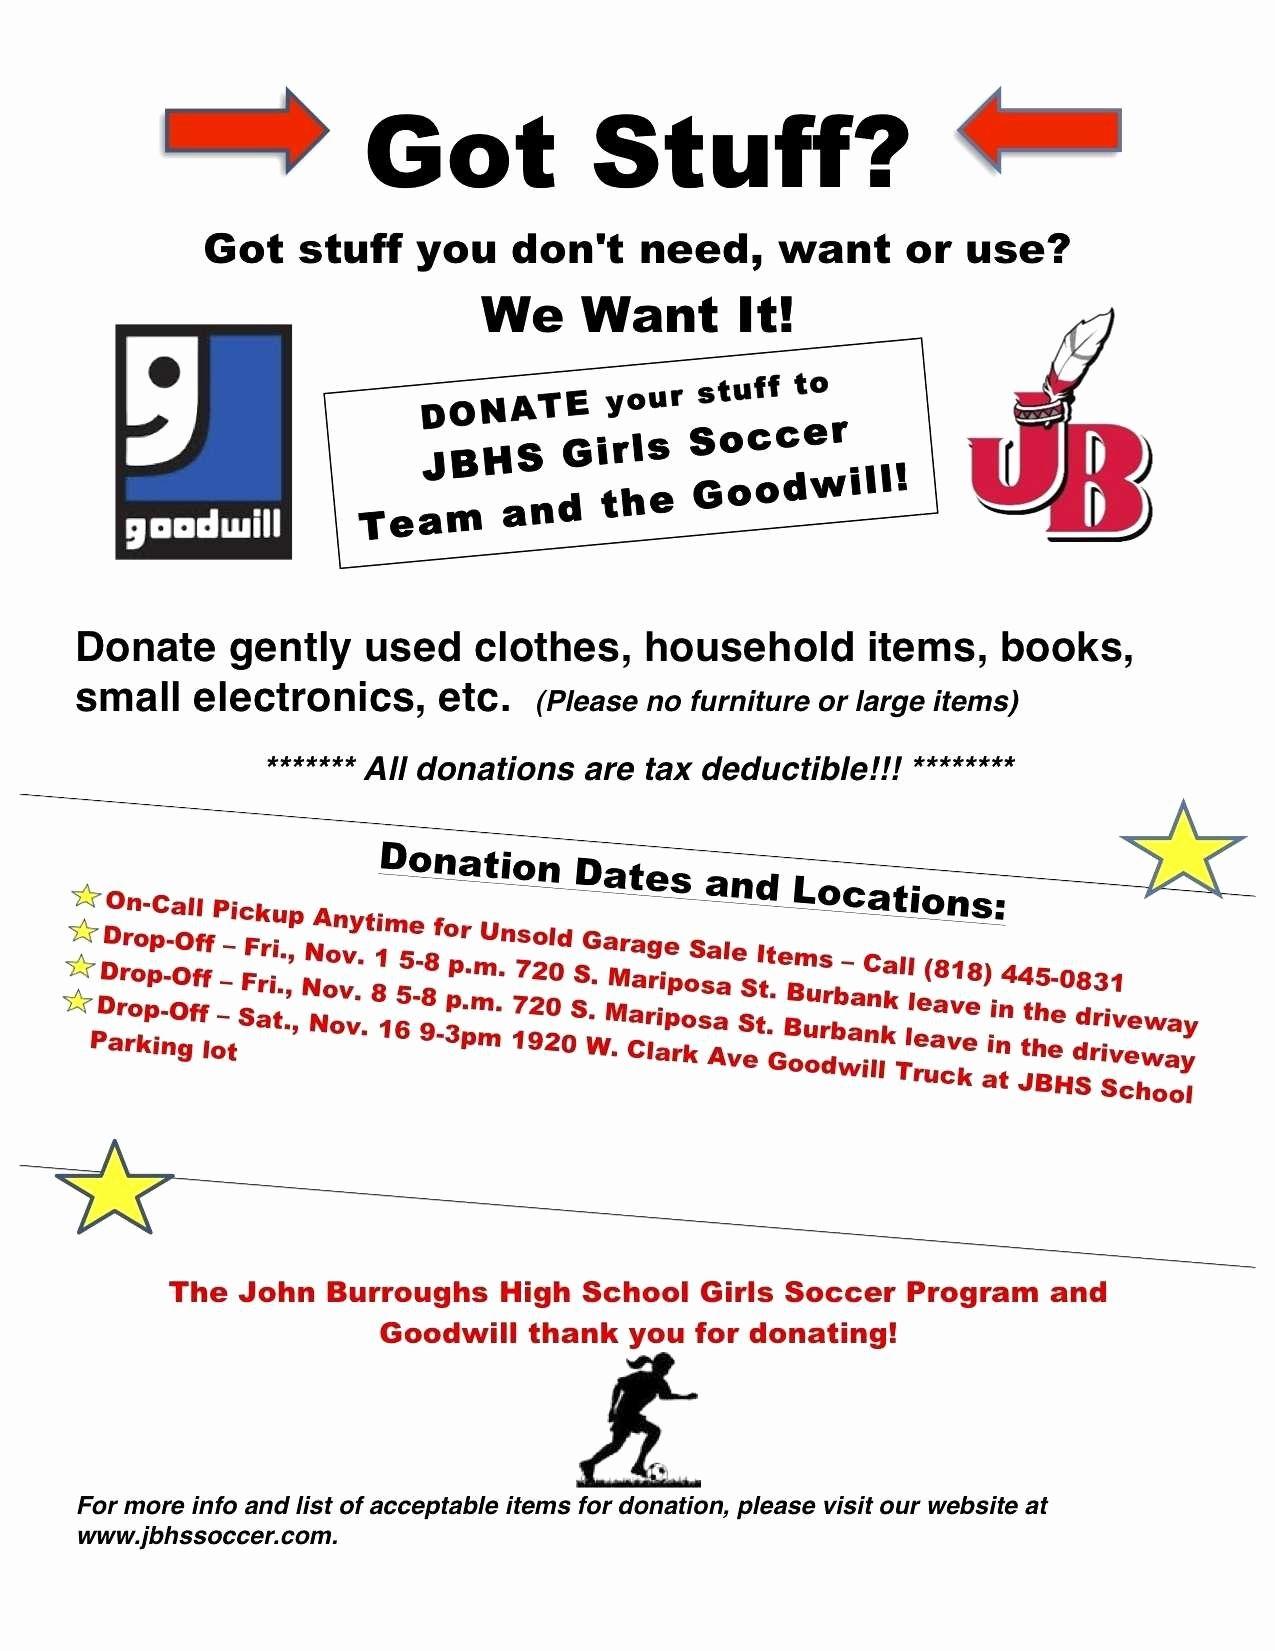 Goodwill Donation Spreadsheet Template